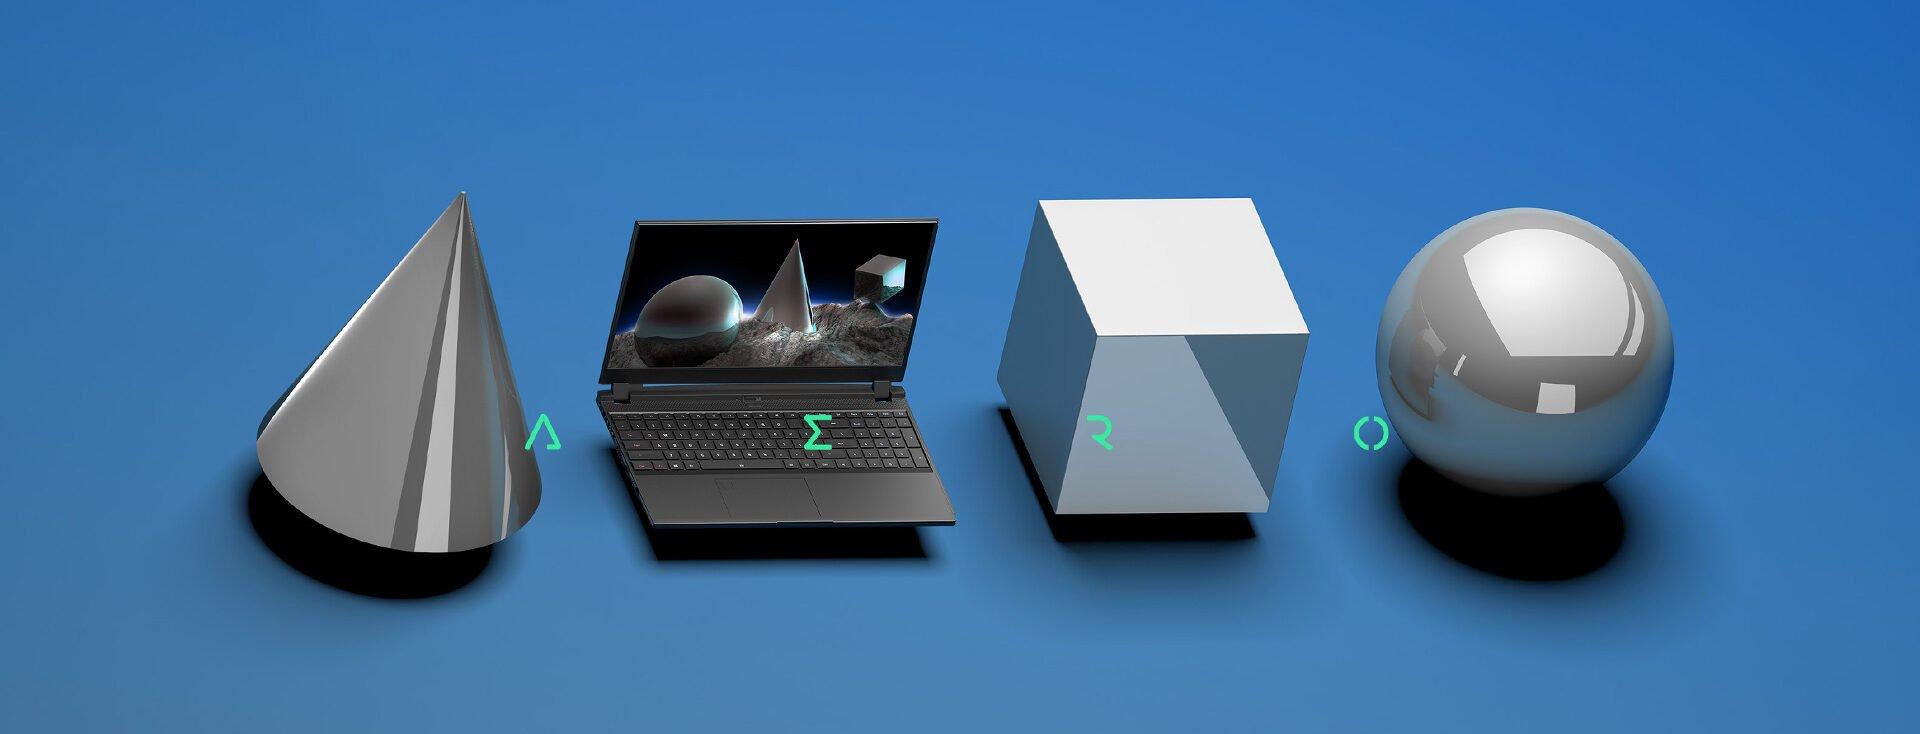 Laptop along side 3D Modeled Objects